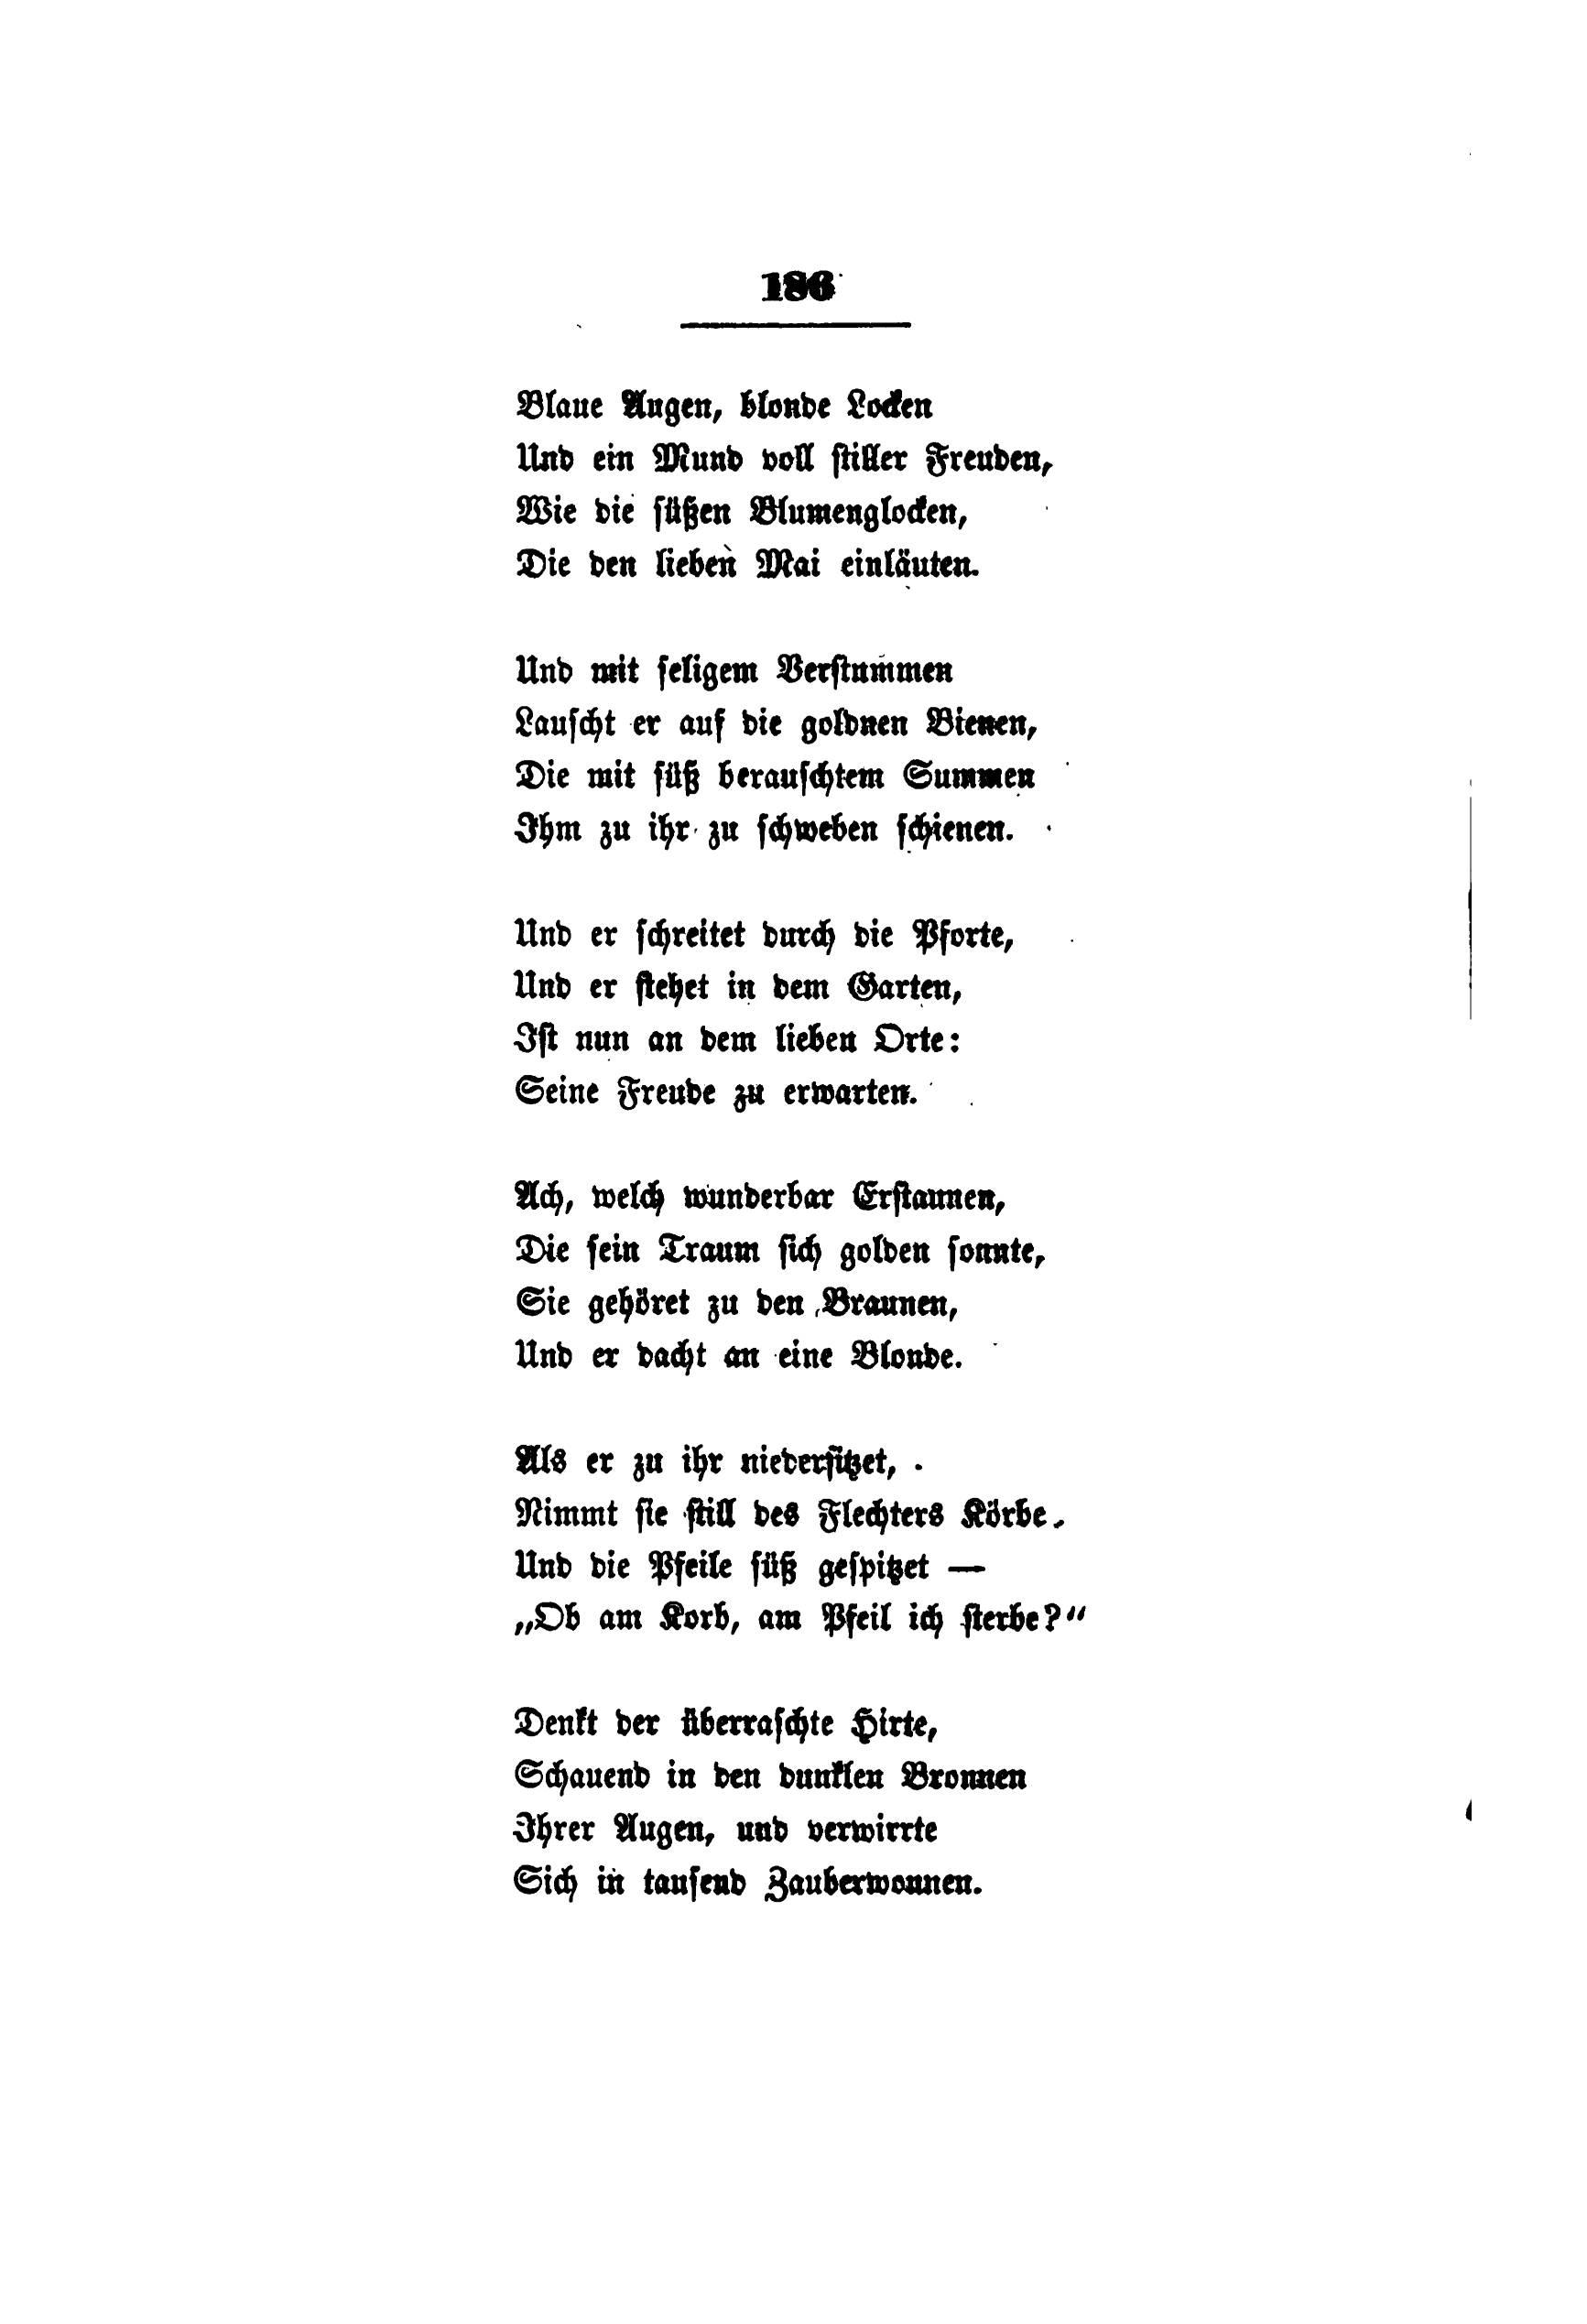 File Clemens Brentano S Gesammelte Schriften II 186 Wikimedia